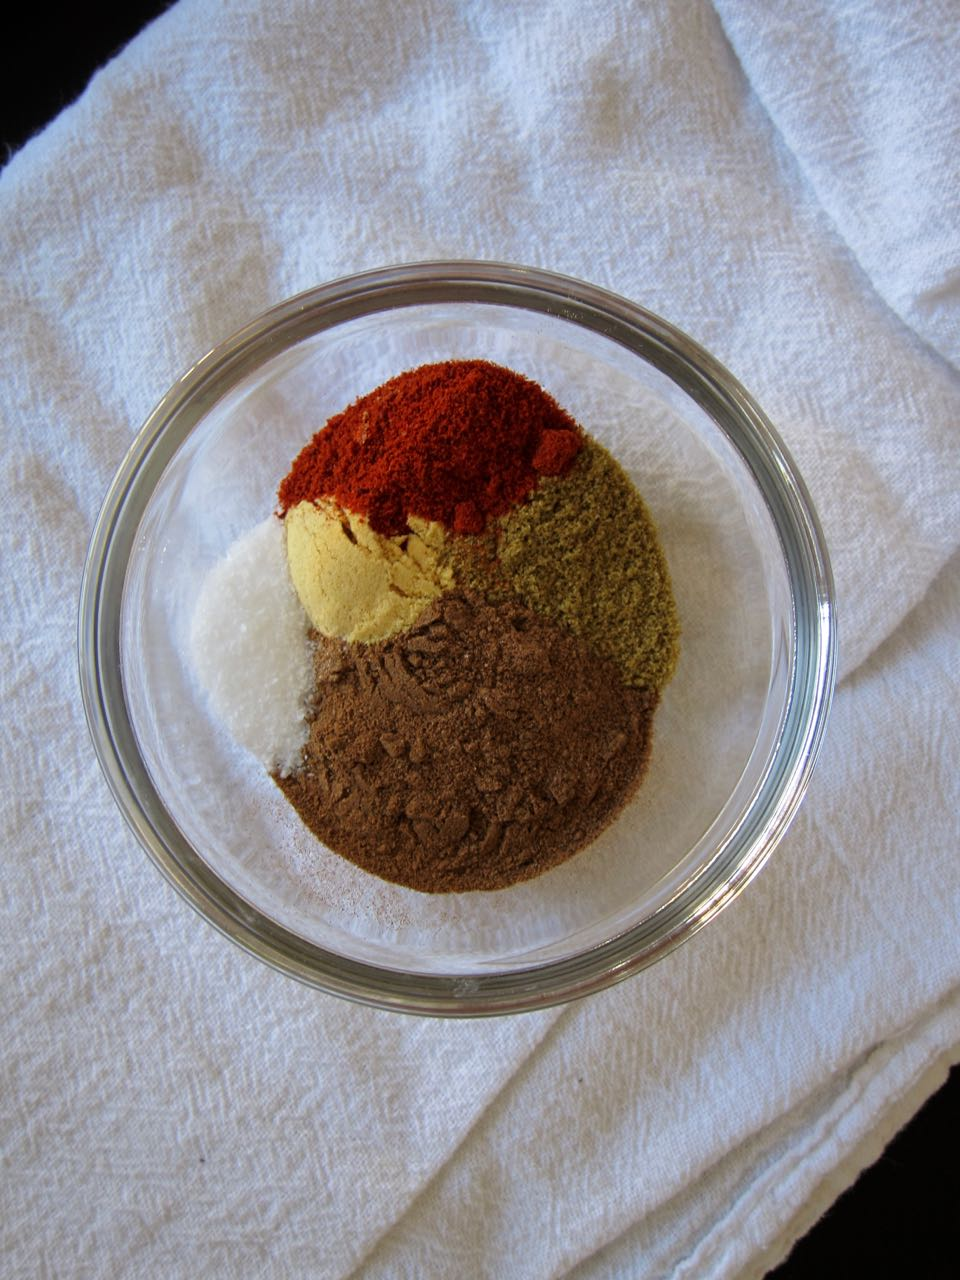 shiitake spice mix.jpg